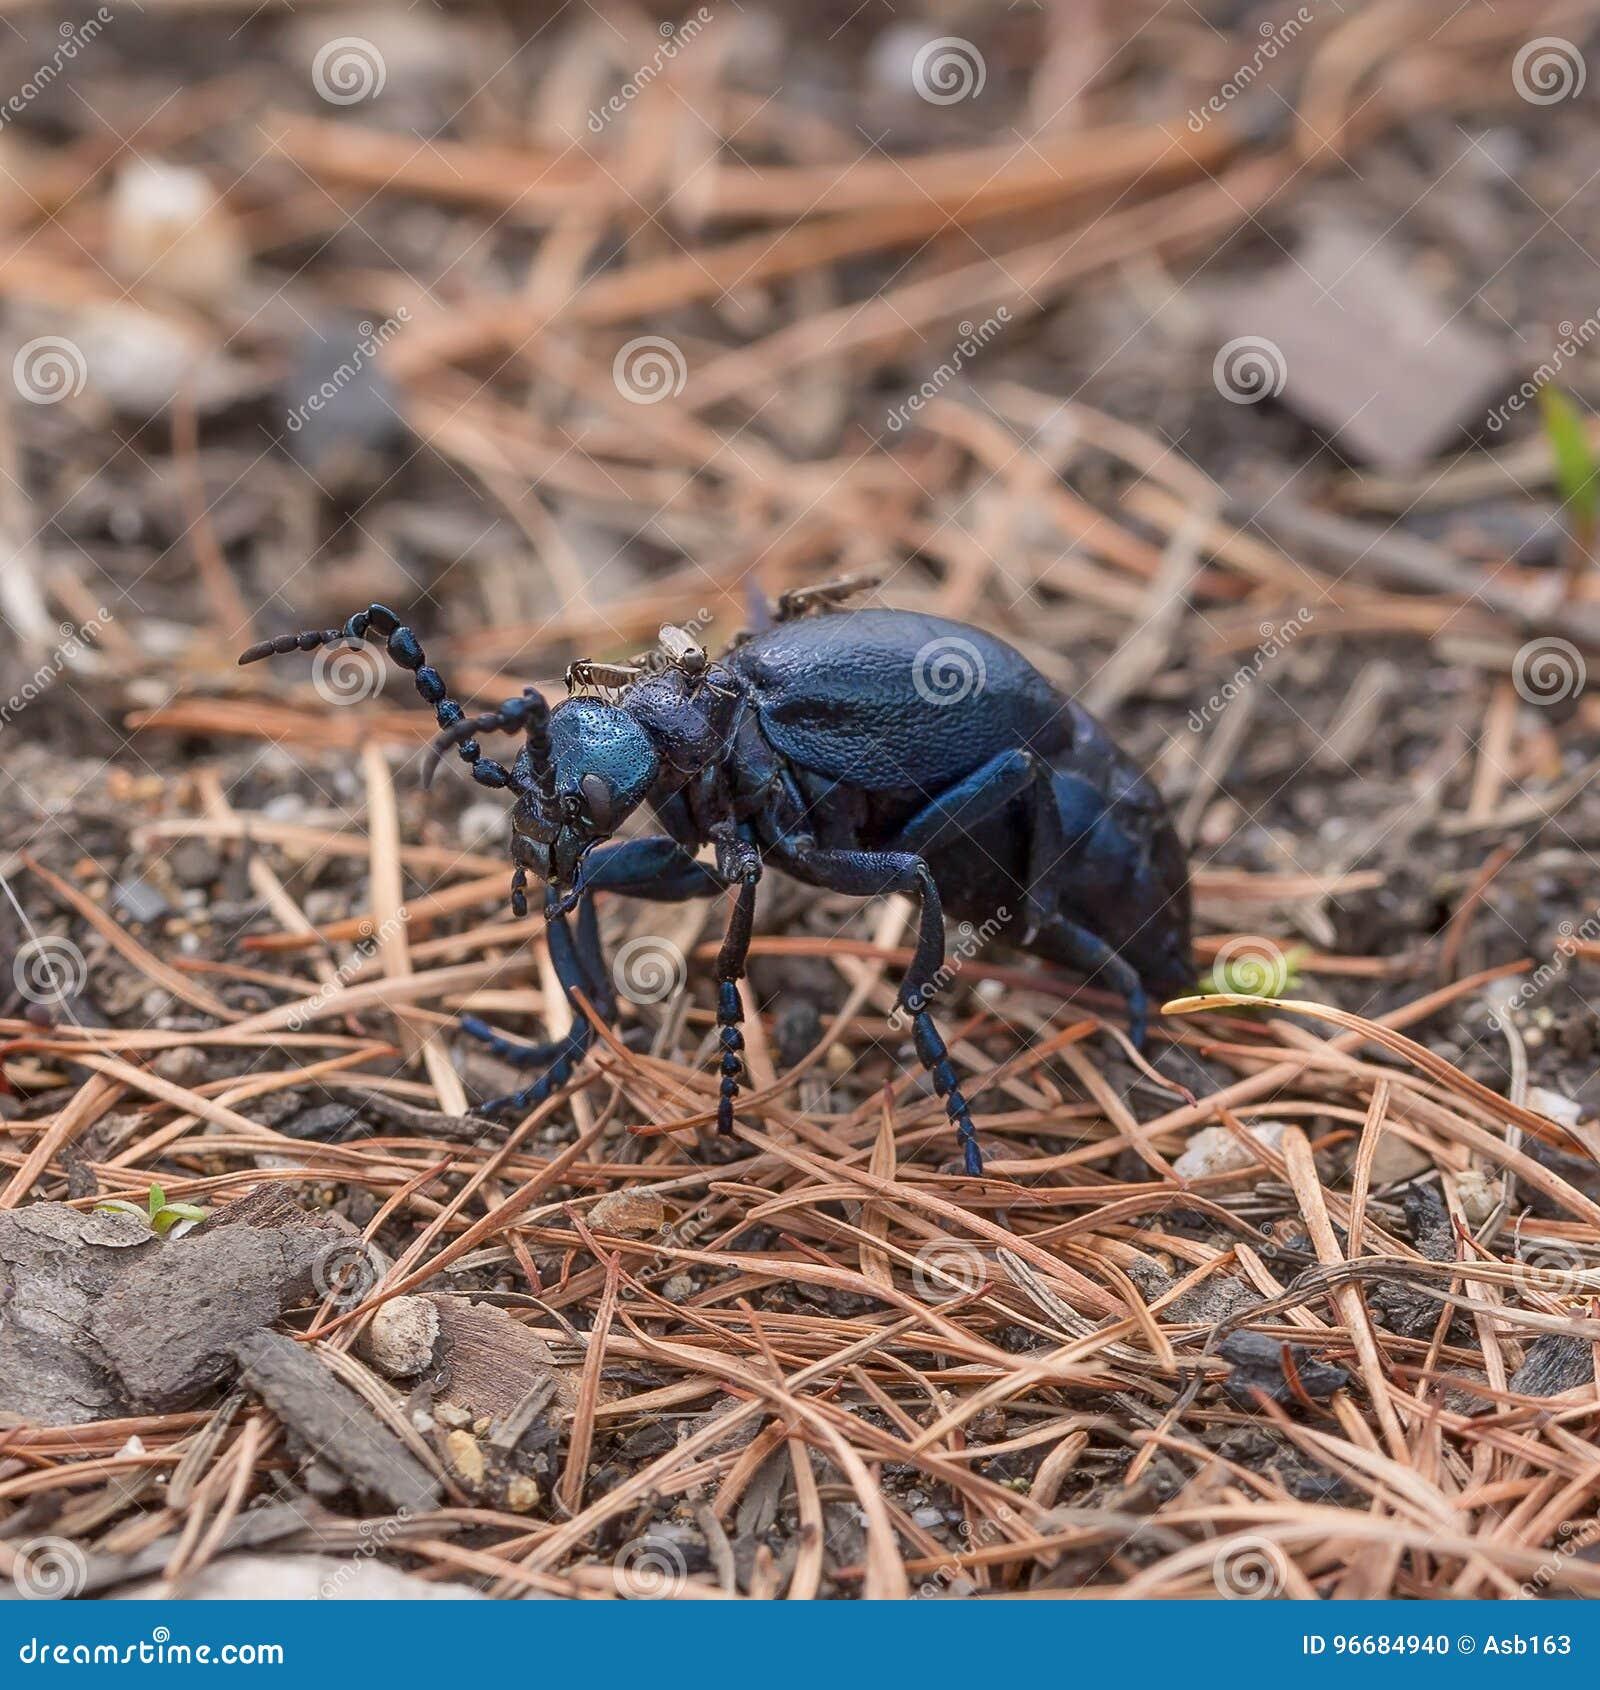 Small Midges Bite Blue Beetle Stock Photo - Image of